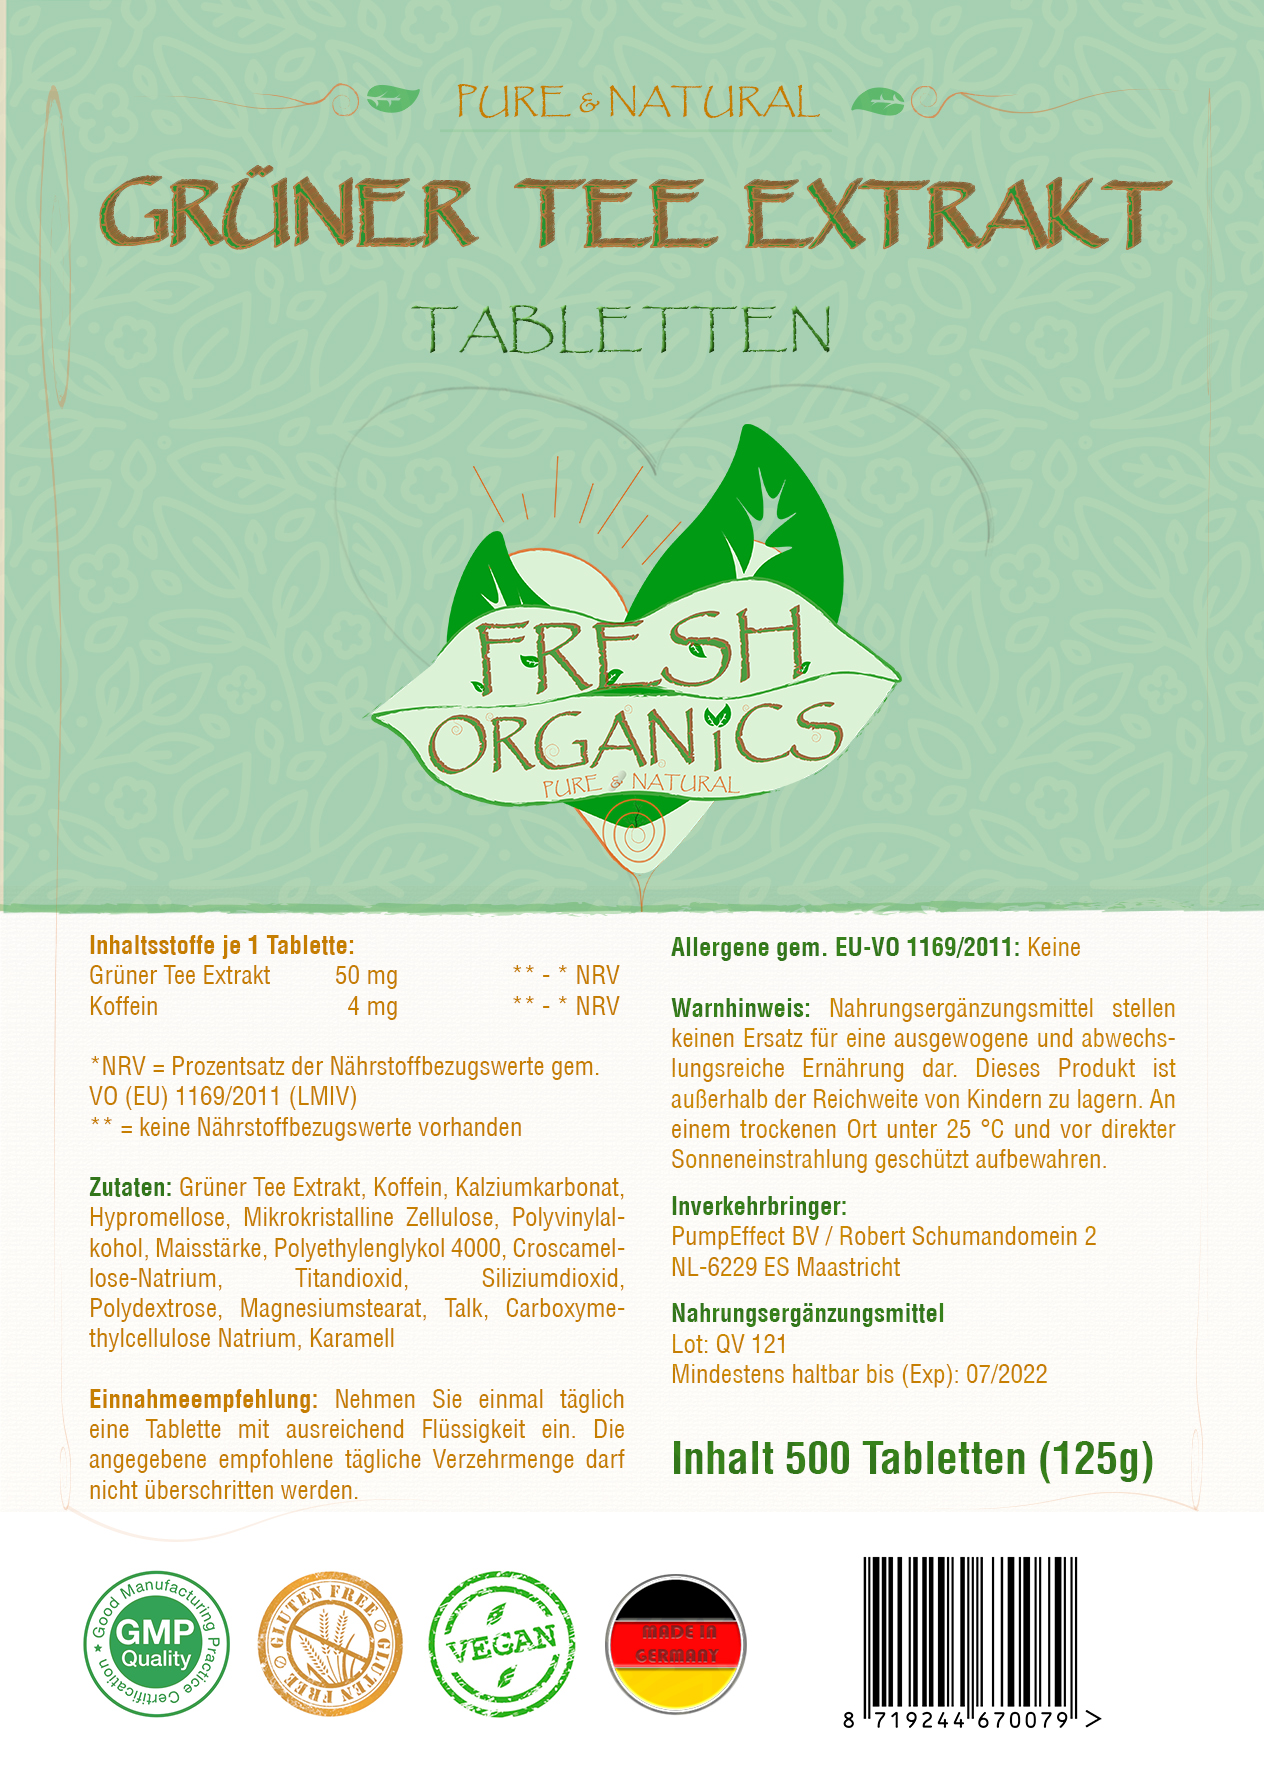 Green Tea Extract - hochdosierter Grüner Tee Extrakt Tabletten - Fatburner & Gewichtsmanagement